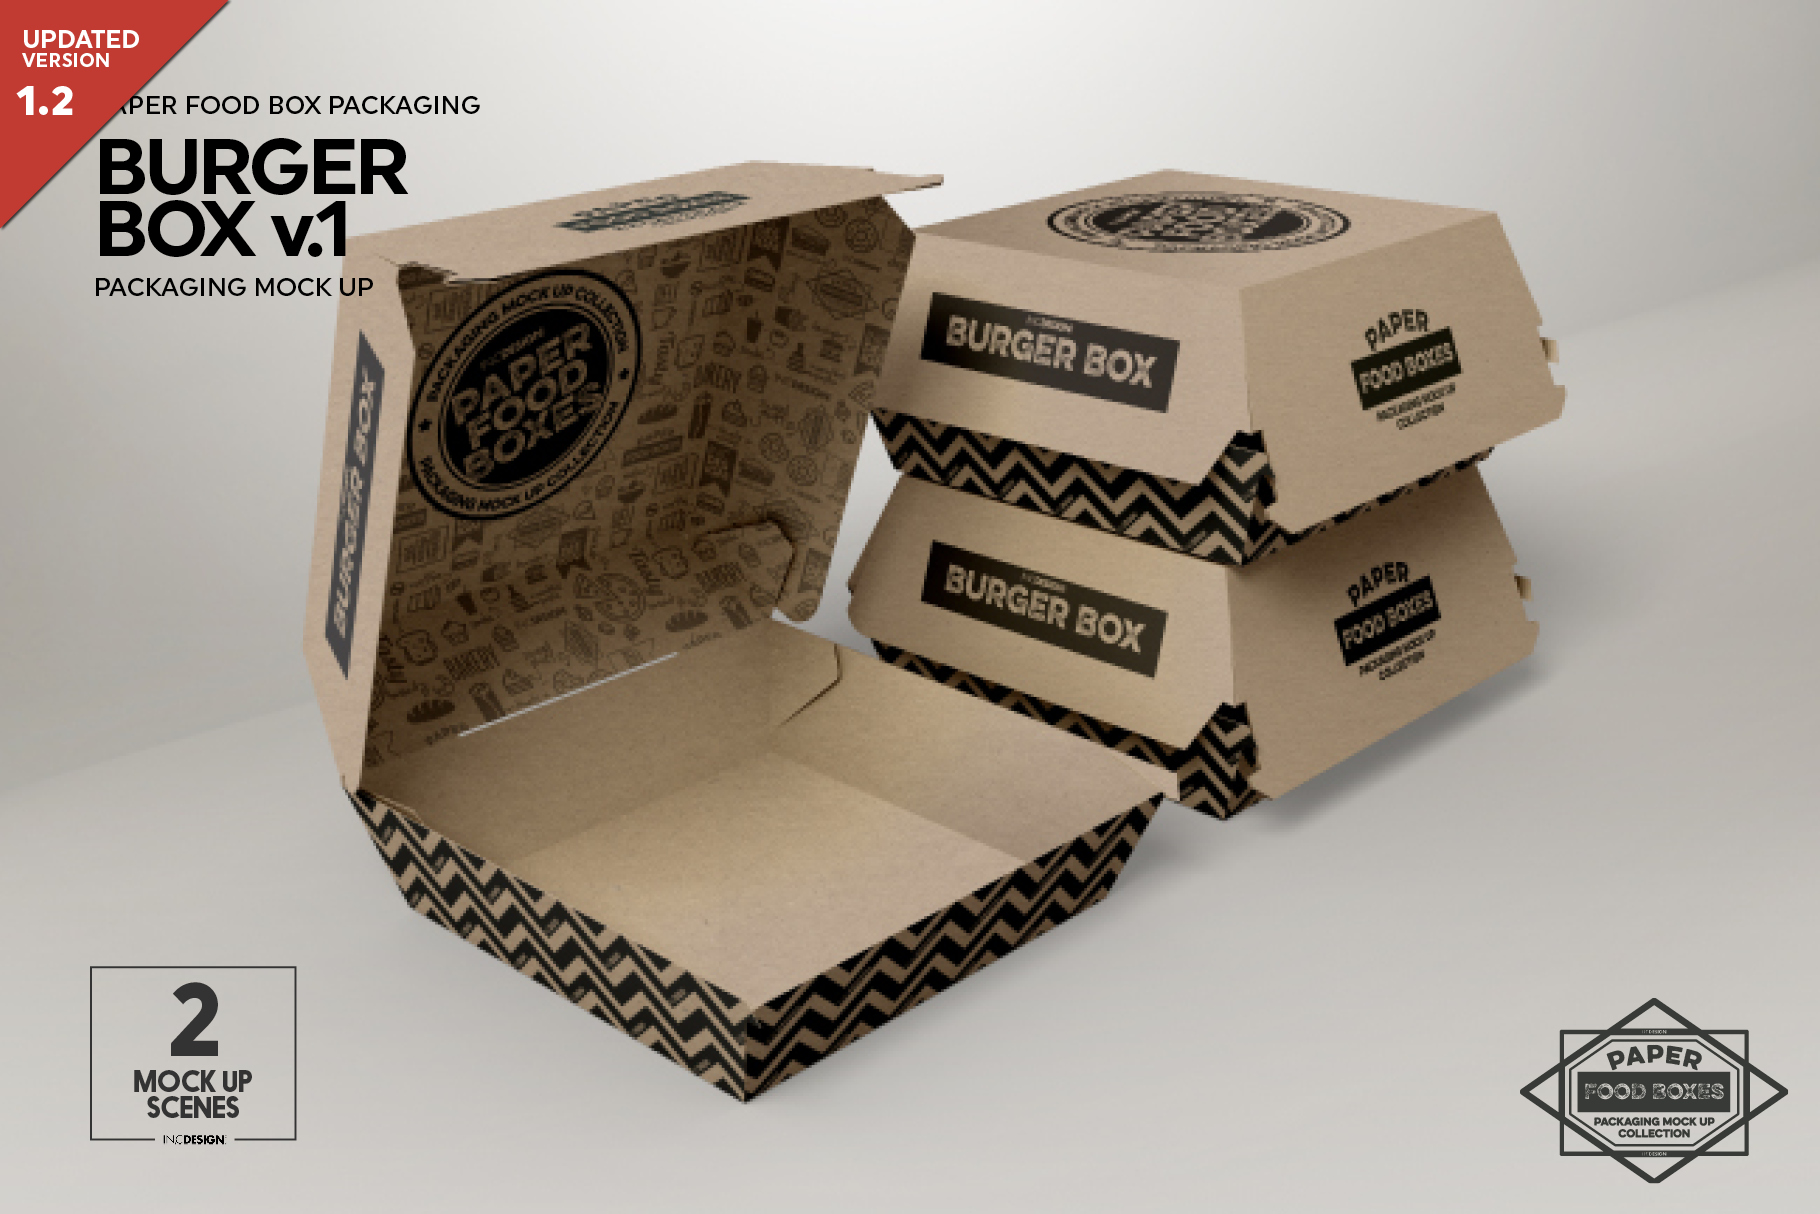 Burger Box Packaging Mock Up v1 example image 1